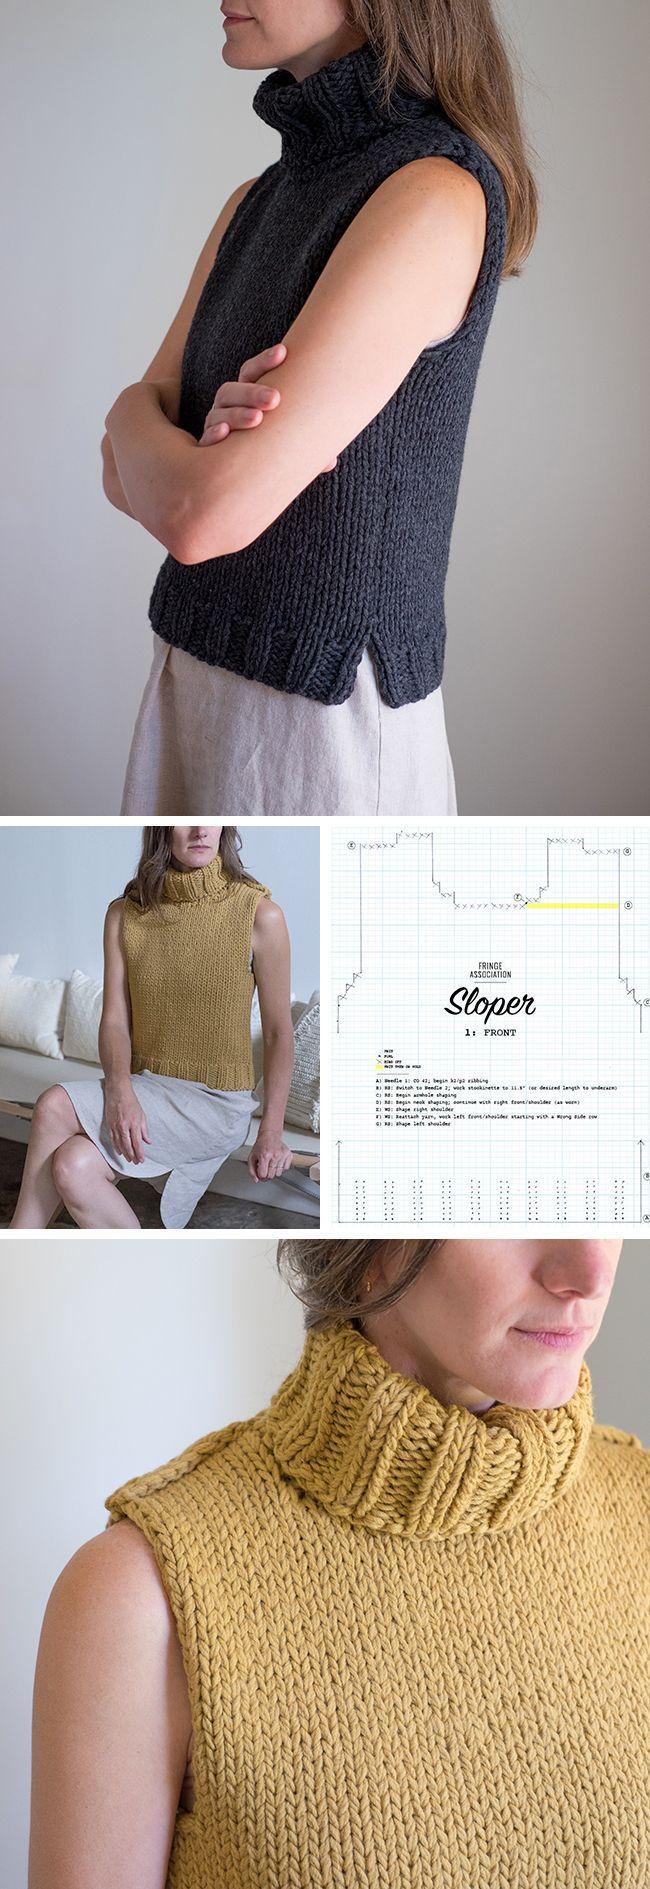 Sloper: Basic template for a sleeveless sweater (free knitting pattern)